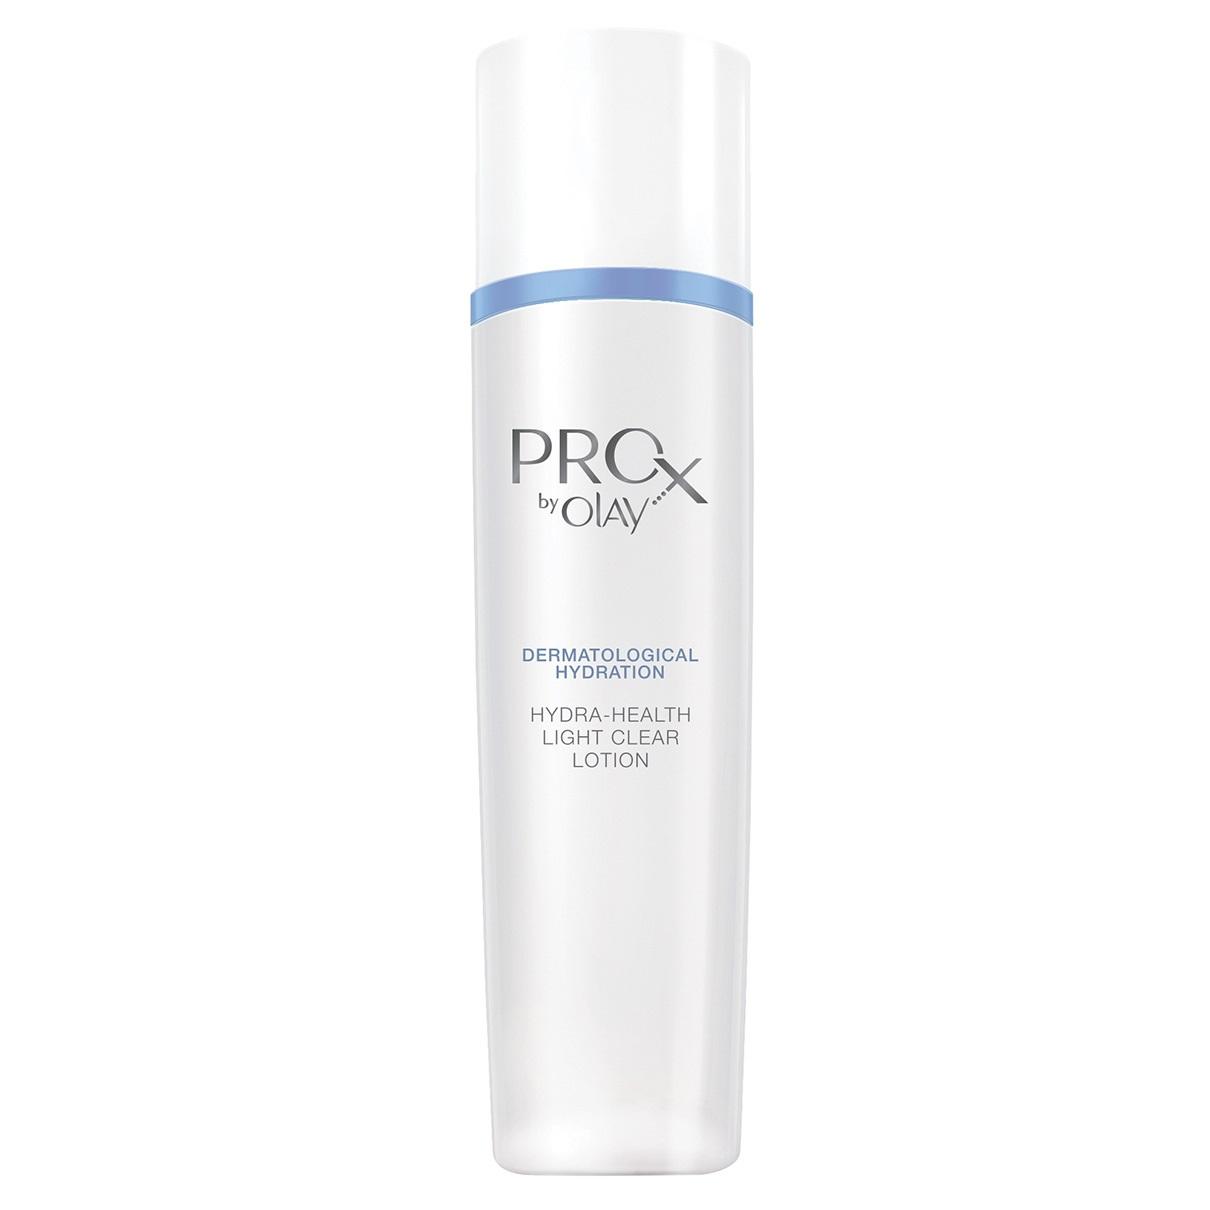 OLAY沁润健颜清爽保湿水 舒润沁透,为后续护肤做准备